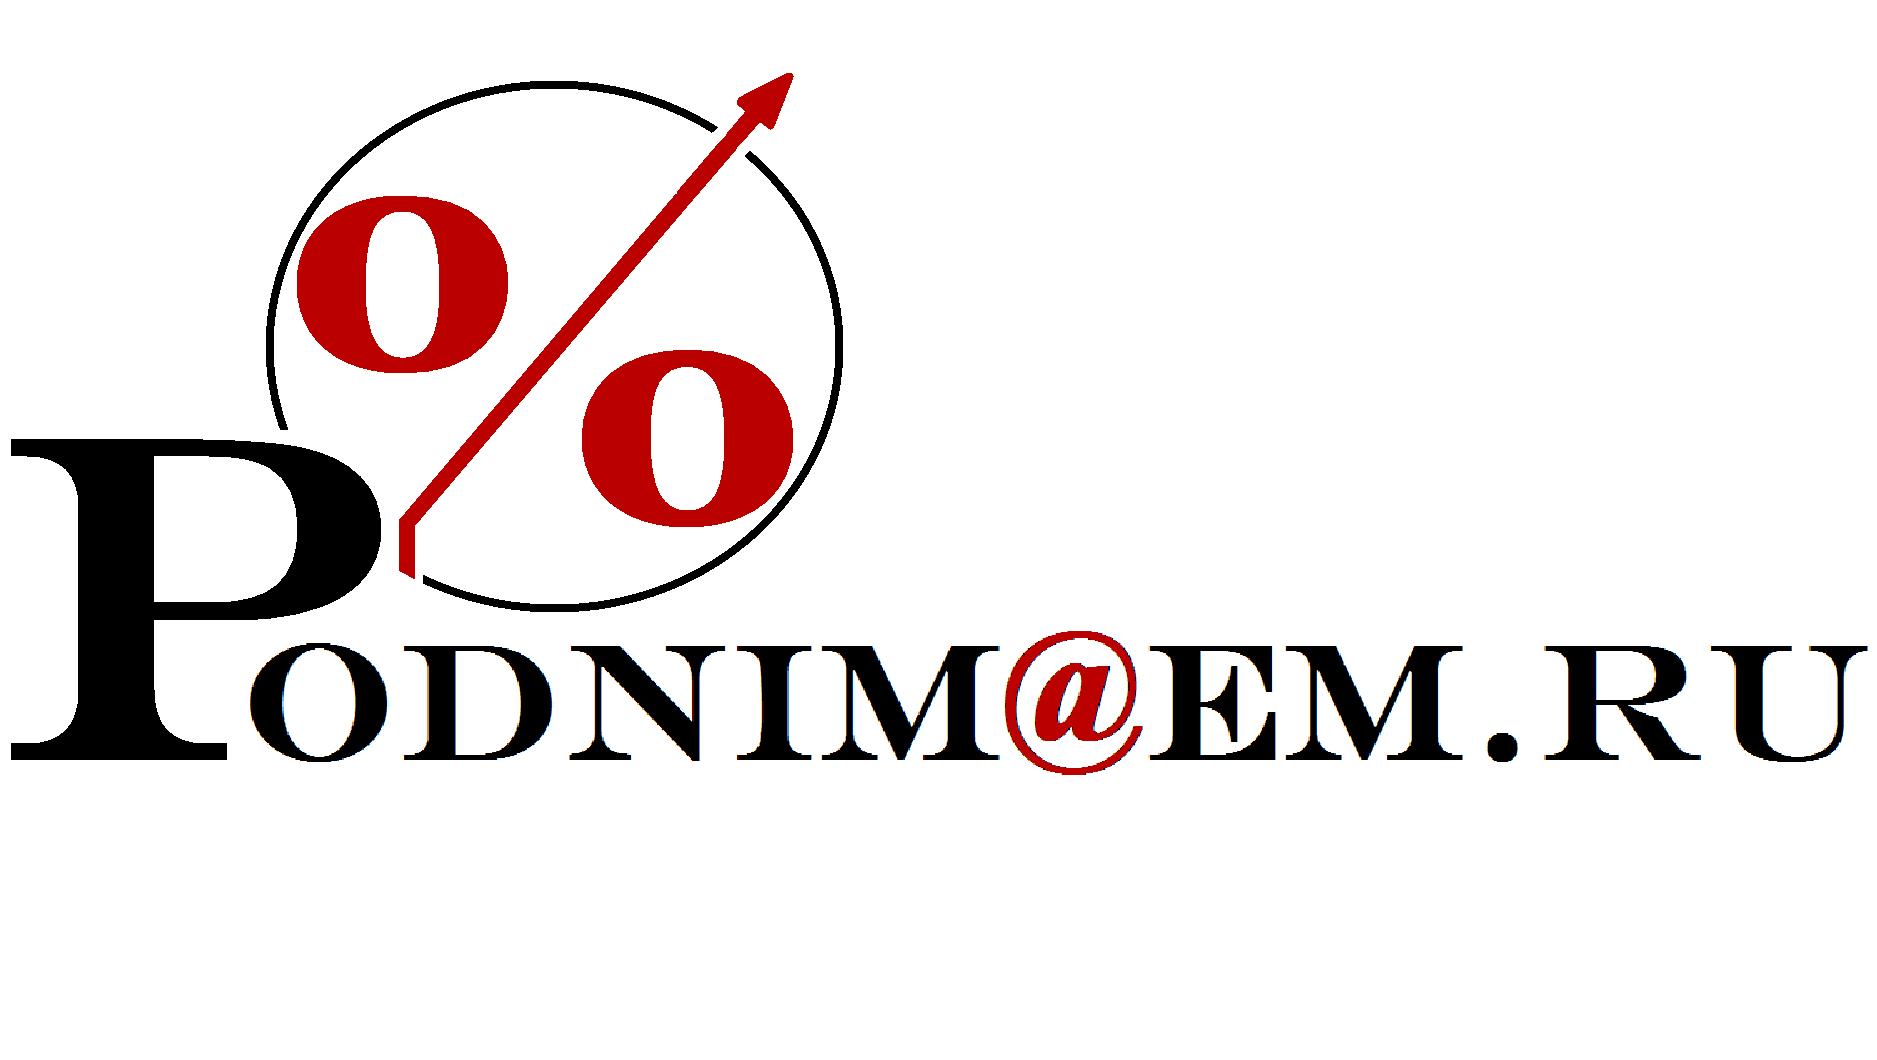 Разработать логотип + визитку + логотип для печати ООО +++ фото f_351554775def2aac.png